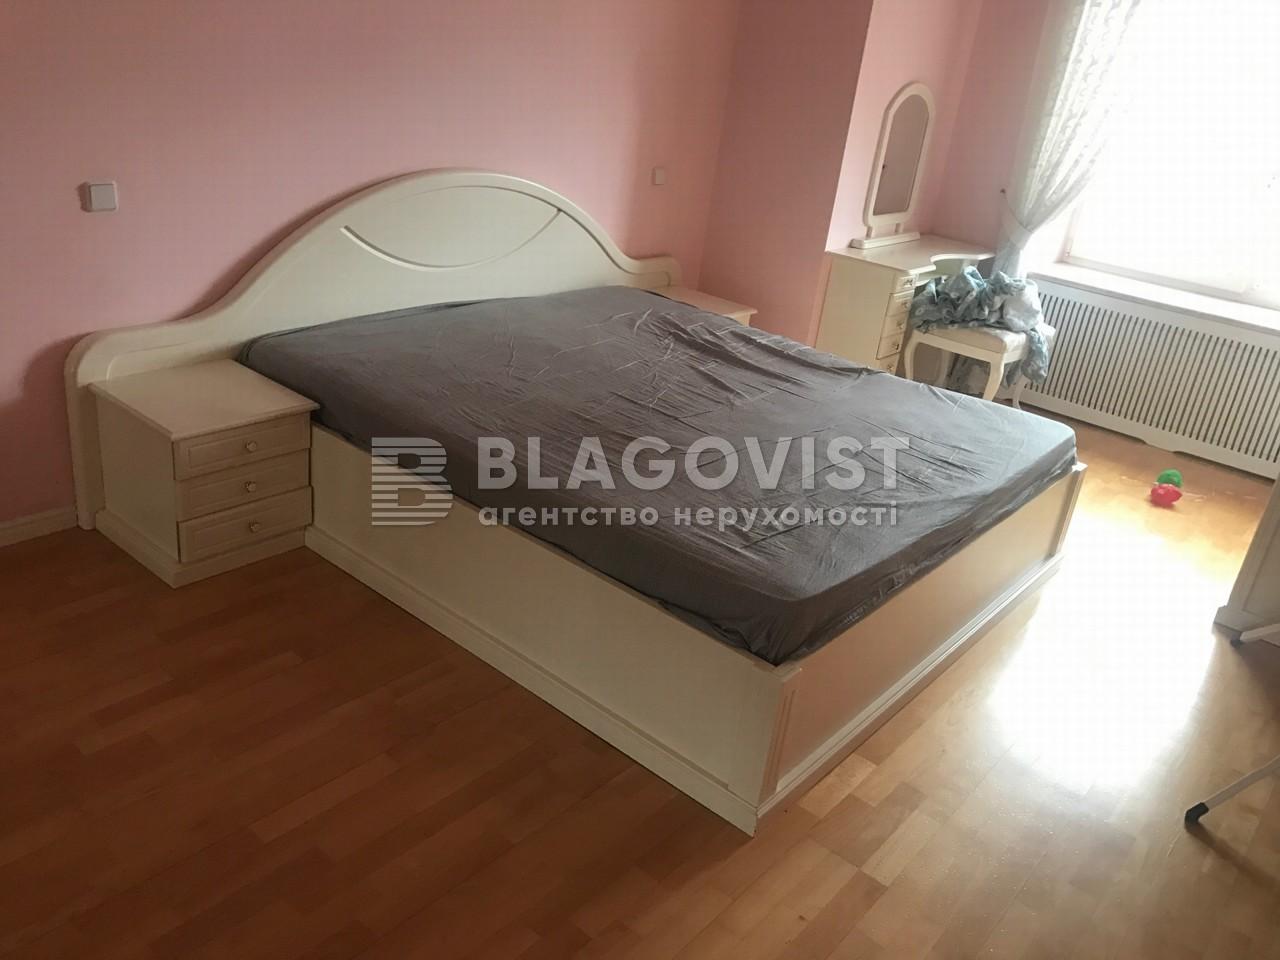 Квартира F-39218, Пожарского, 4, Киев - Фото 8